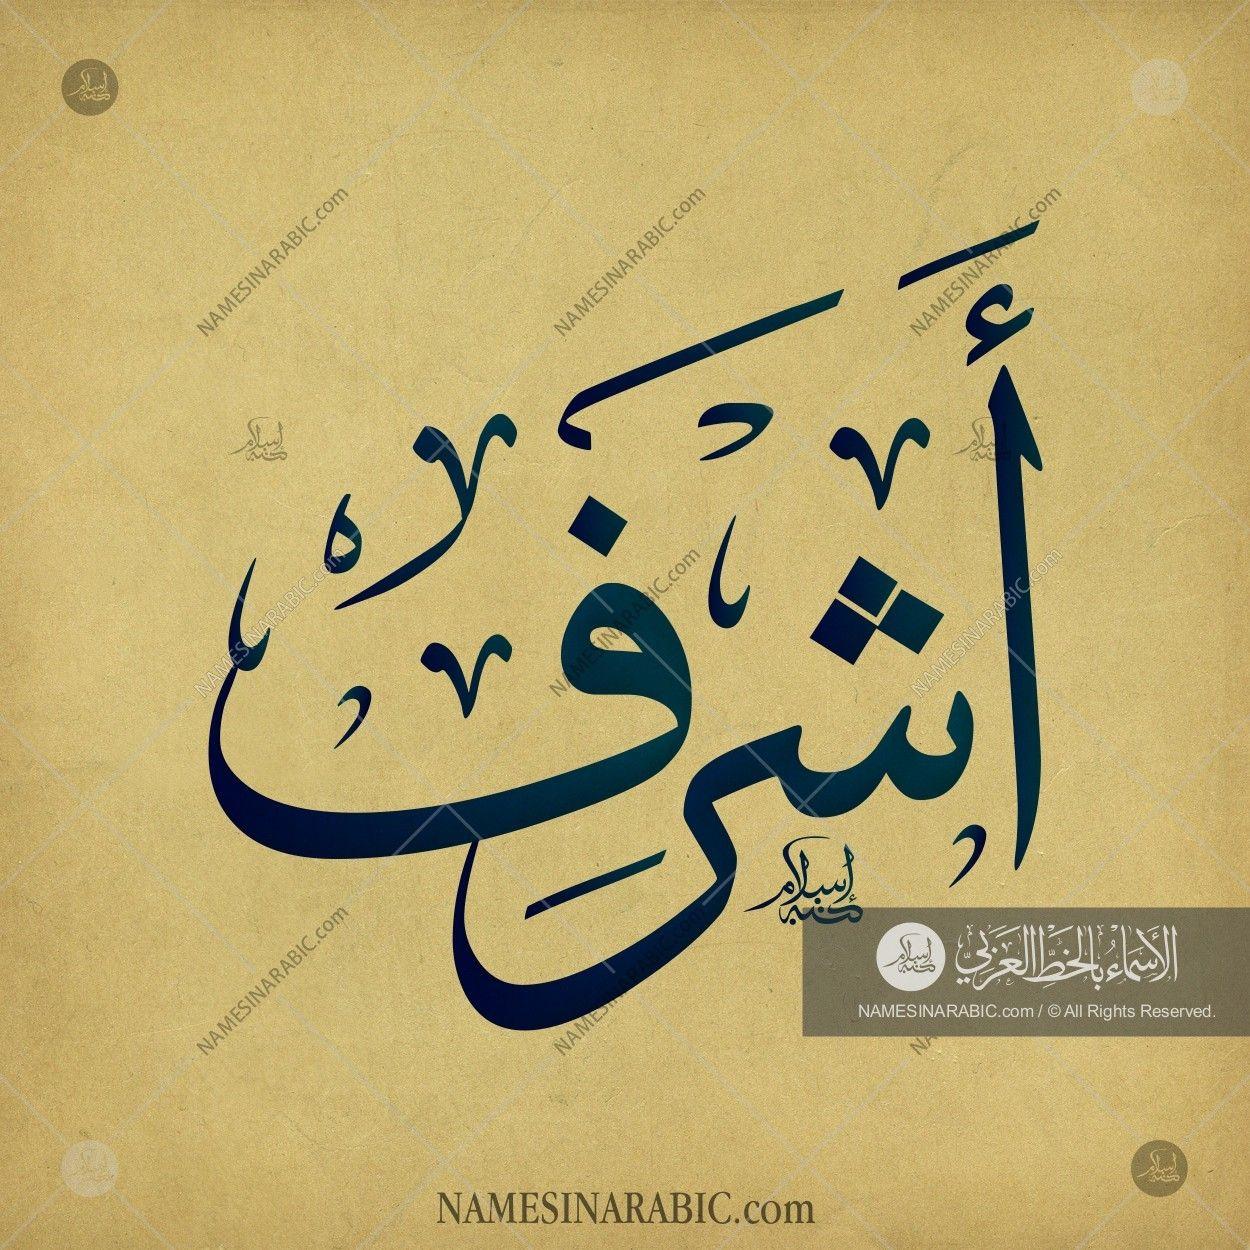 Ashraf اشرف Names In Arabic Calligraphy Name 3246 Calligraphy Name Name Wallpaper Calligraphy